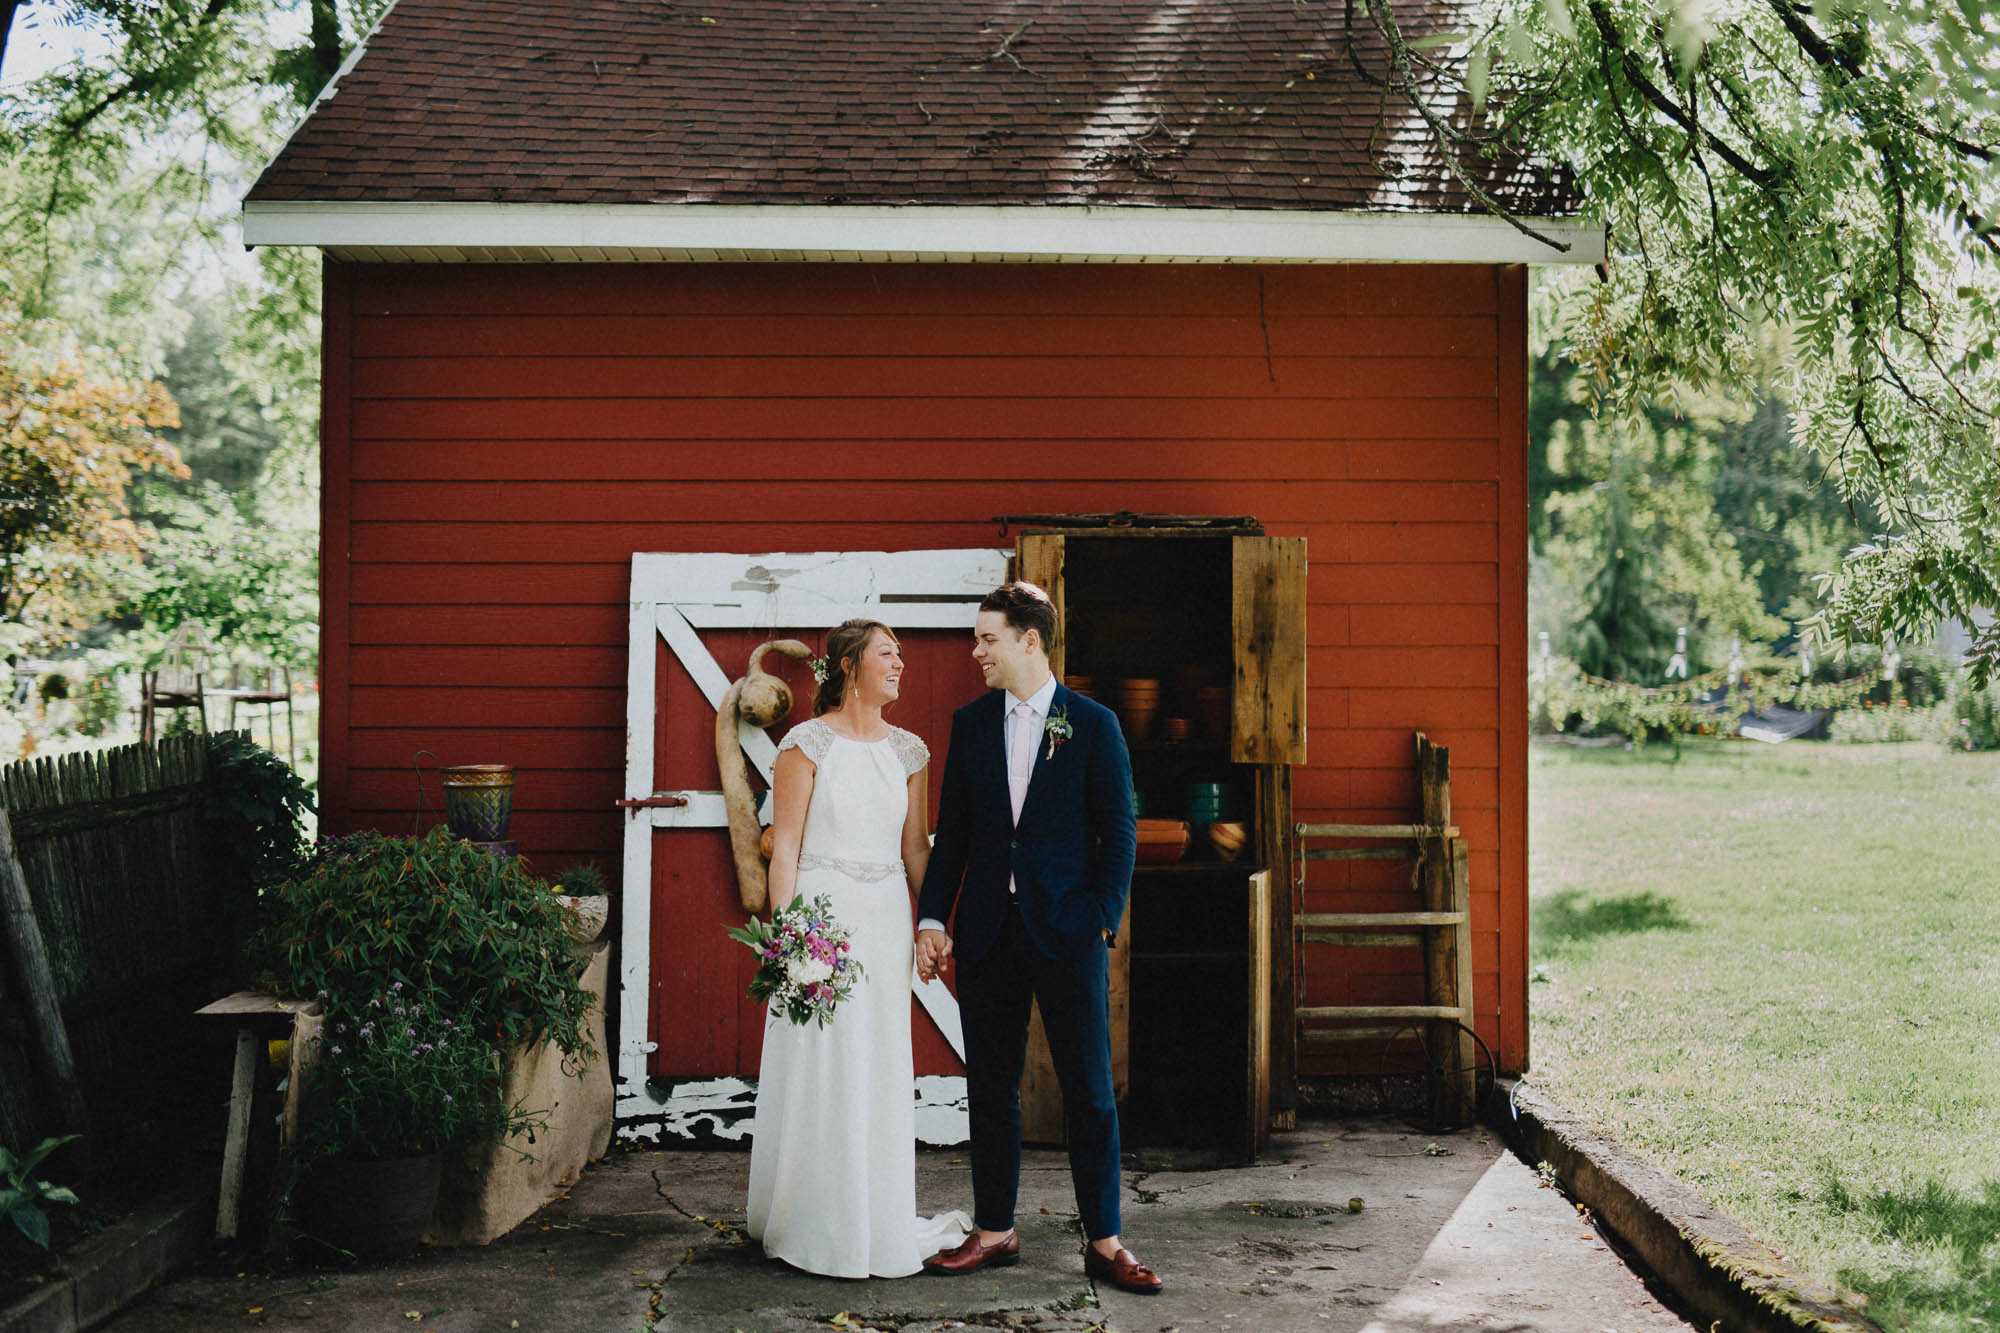 Leah-Graham-Michigan-Outdoor-DIY-Wedding-071@2x.jpg